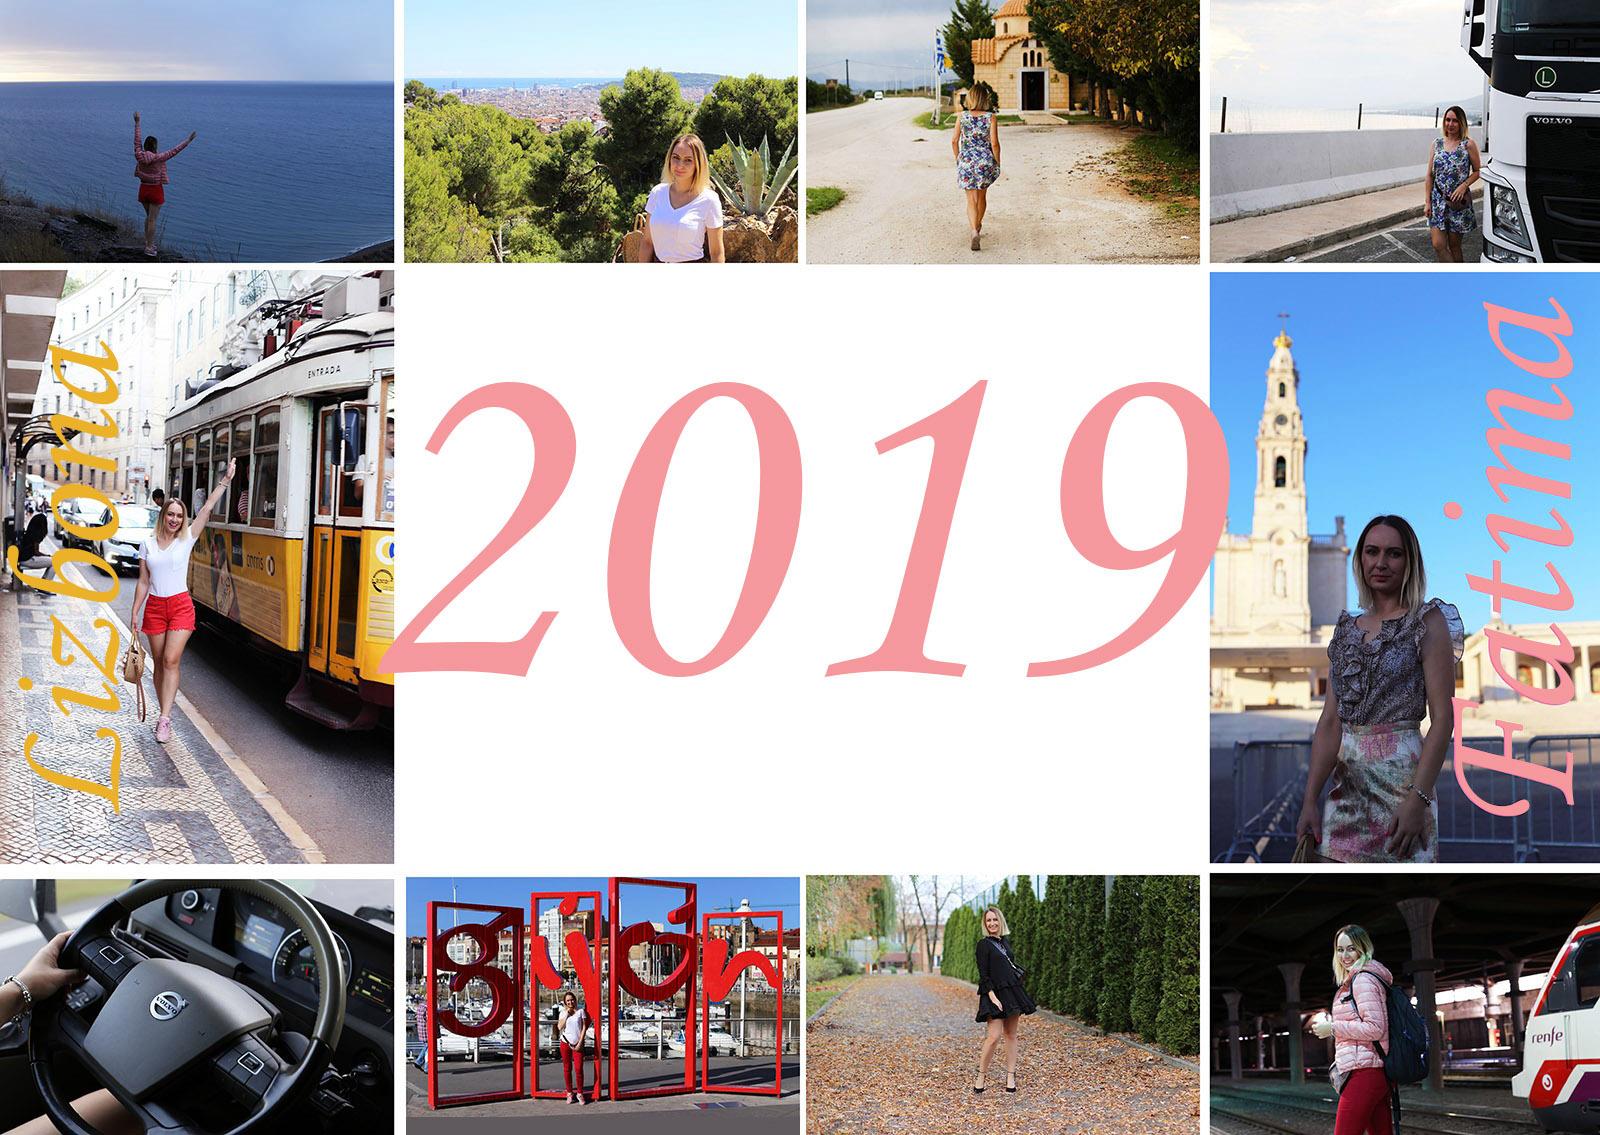 2019 - podsumowanie roku